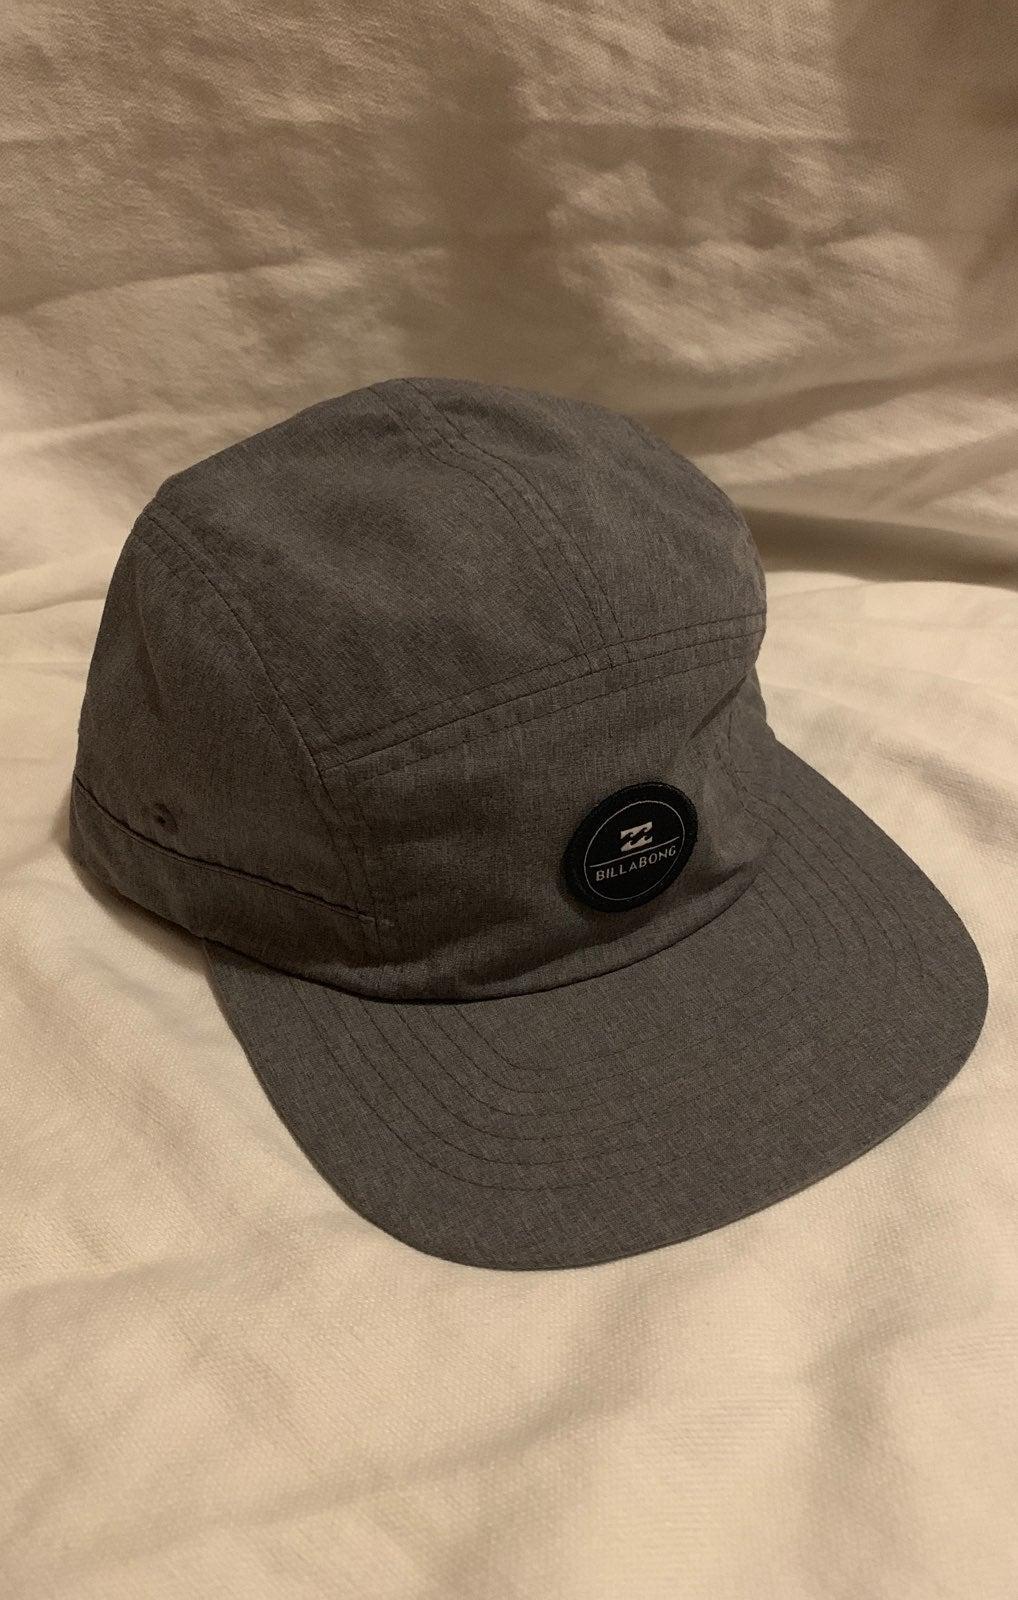 Billabong Barnaby hat